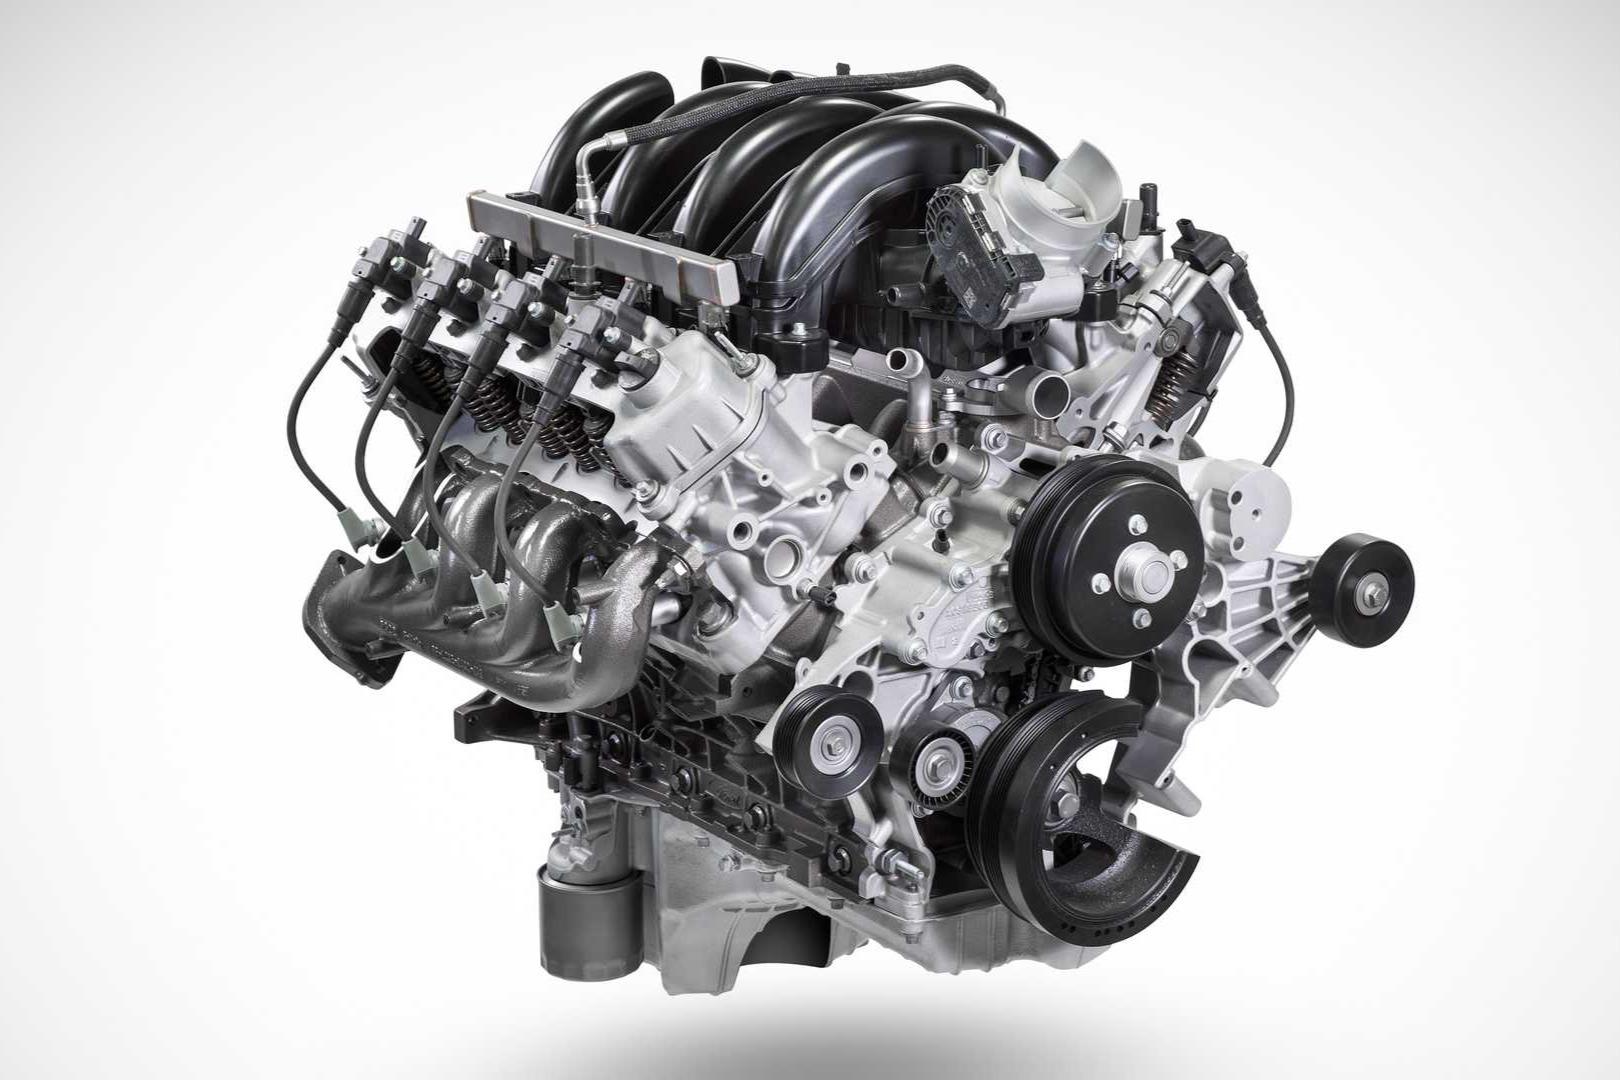 motor V8 Godzilla 7.3